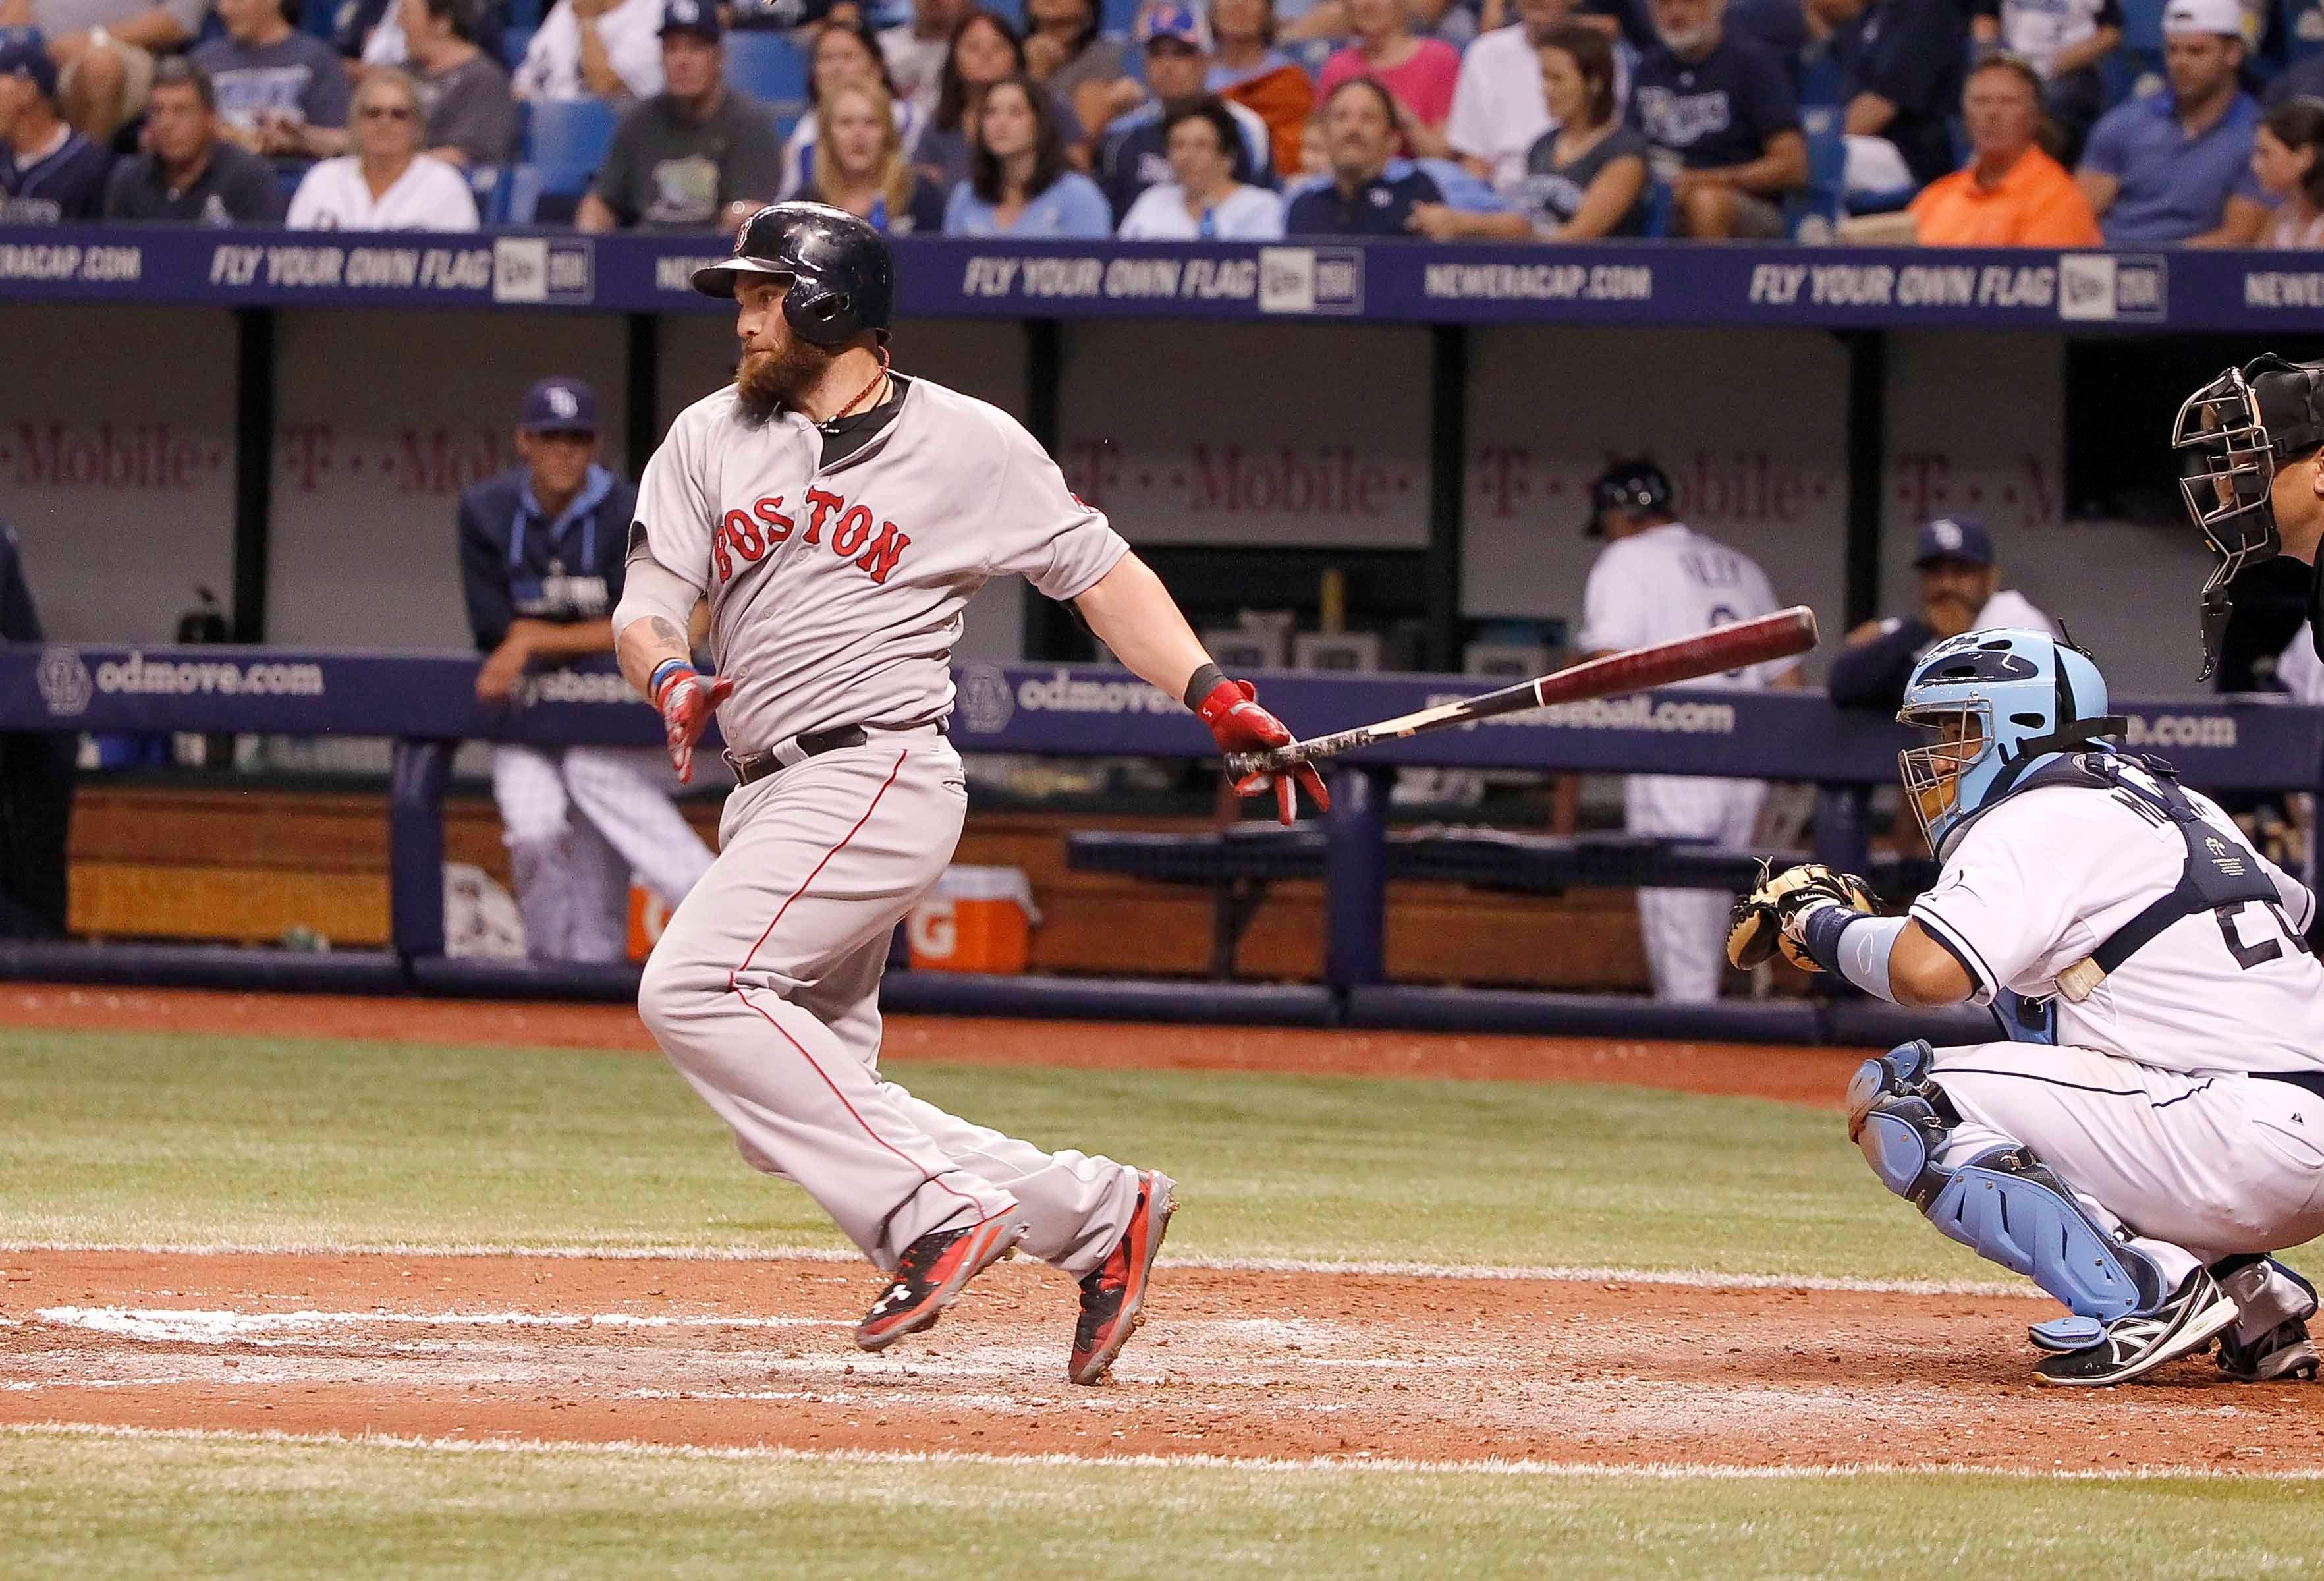 2014-07-27T021926Z_633993243_NOCID_RTRMADP_3_MLB-BOSTON-RED-SOX-AT-TAMPA-BAY-RAYS.jpg